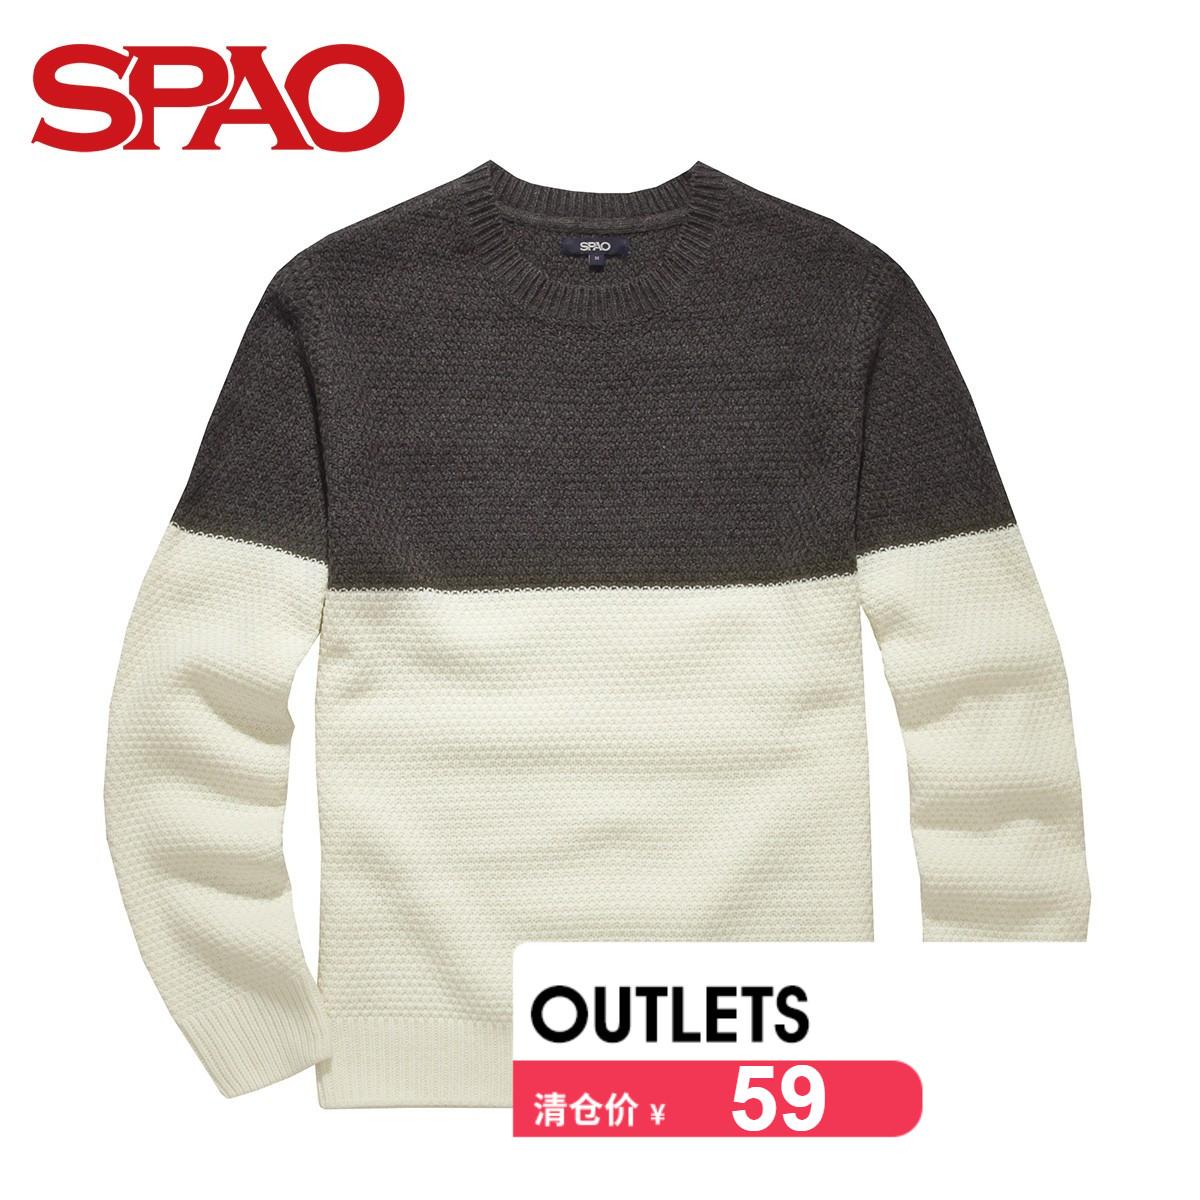 SPAO韓國衣戀 2016春夏 男式撞色圓領毛衣 SPKW611C08